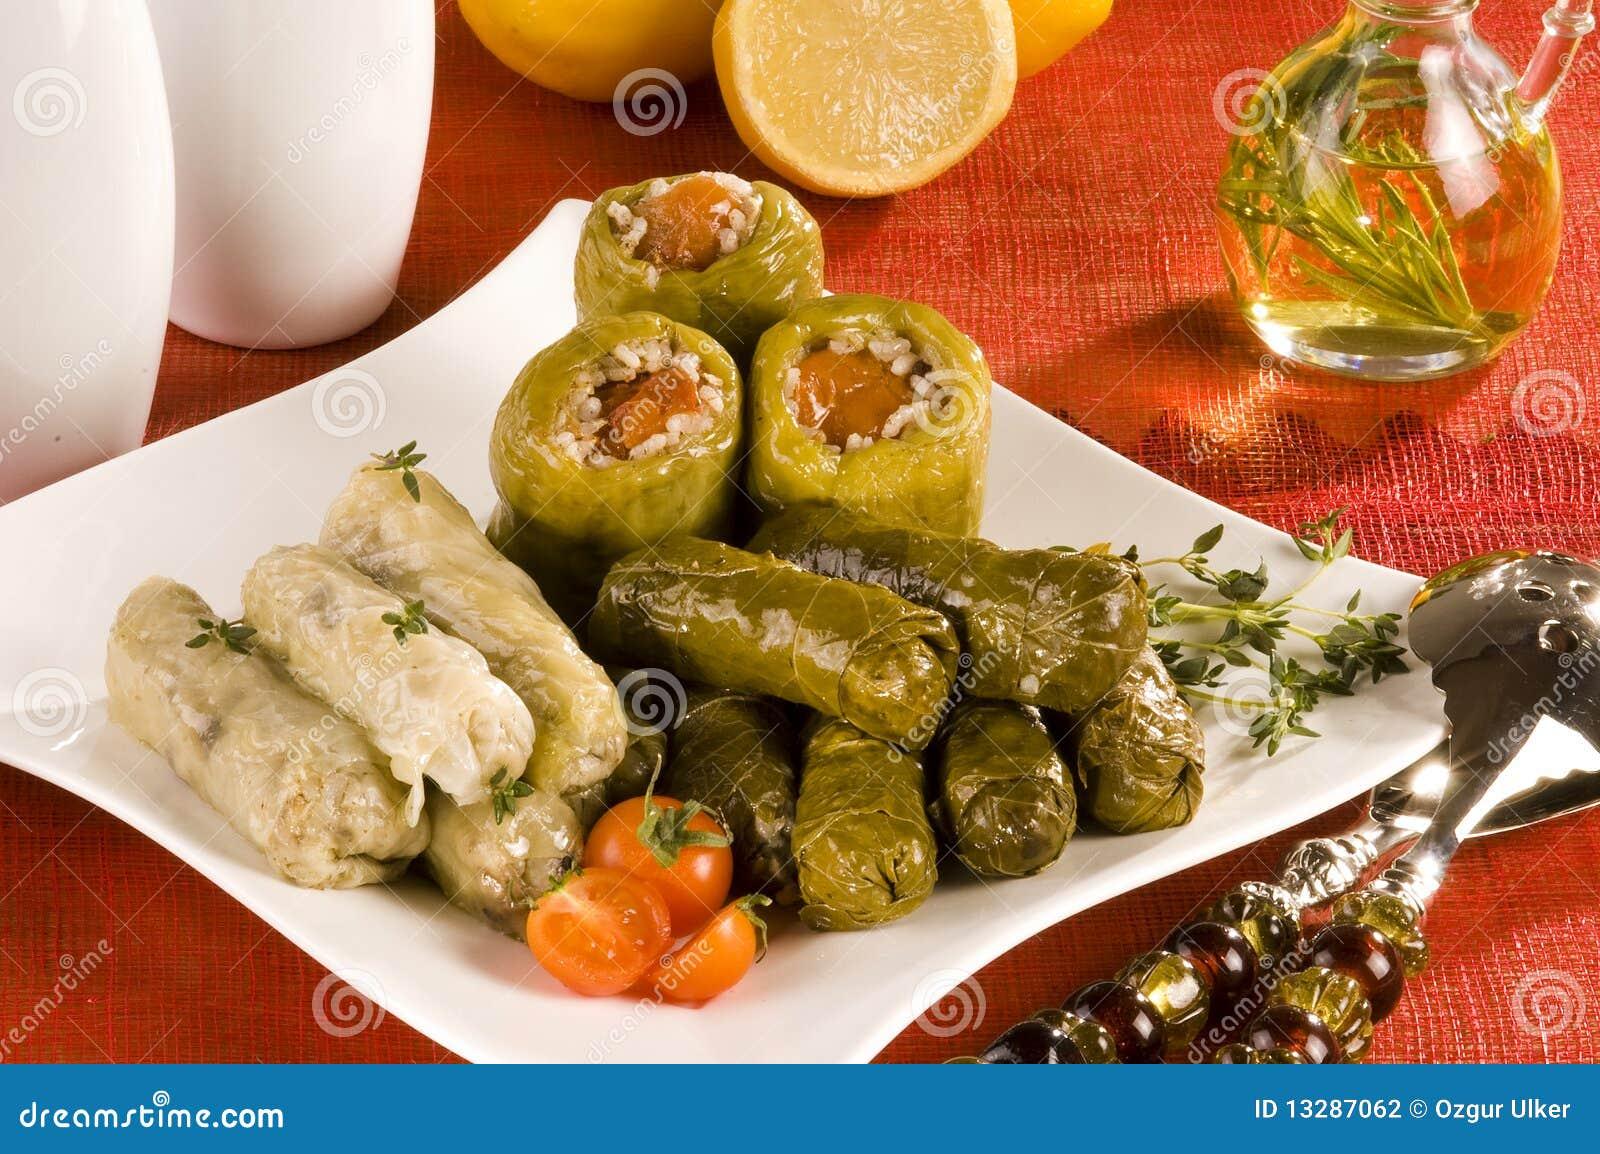 how to make turkish dolma